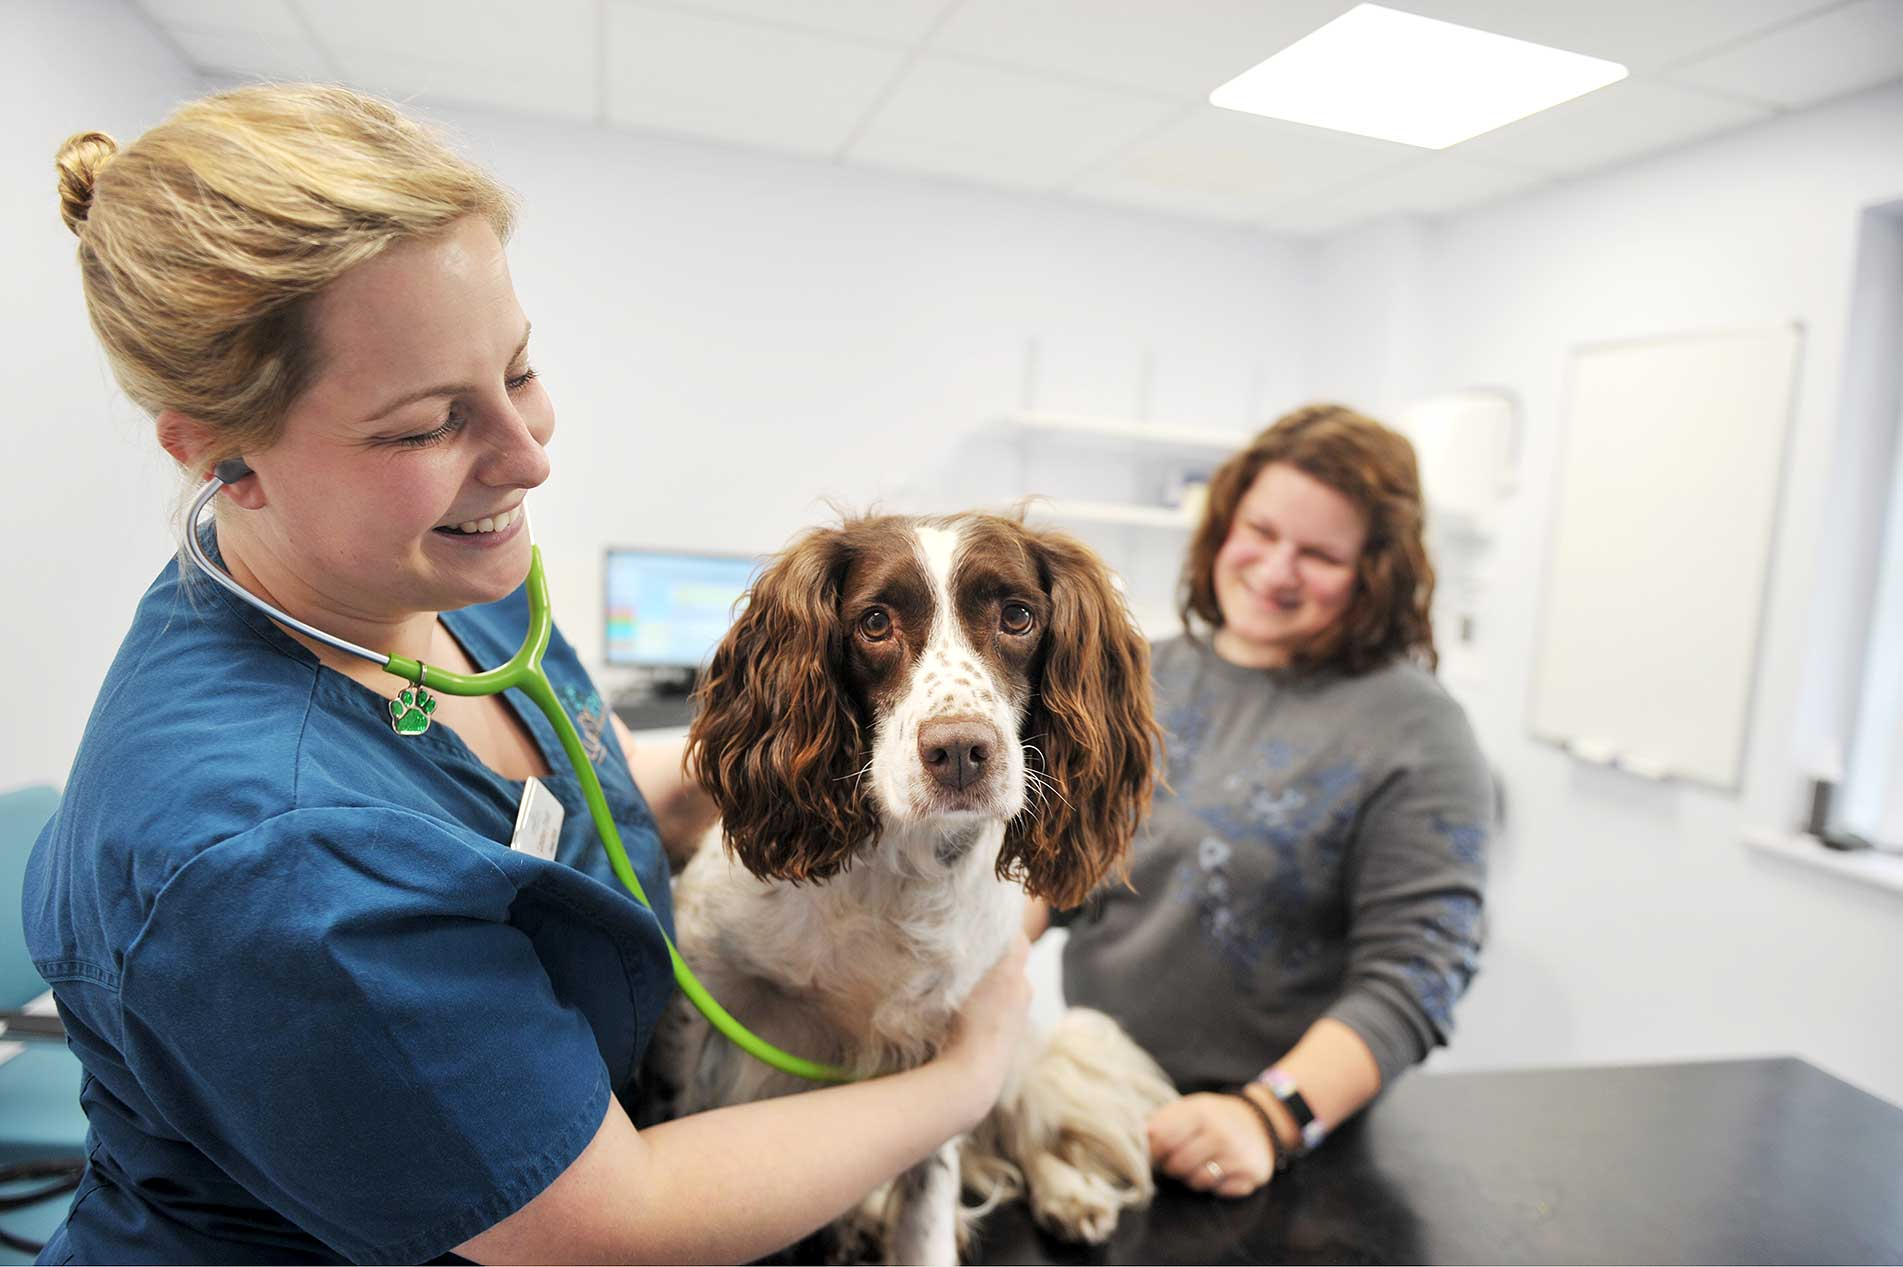 Lindsey Dodd, Head Nurse at Lumbry Park checking dog